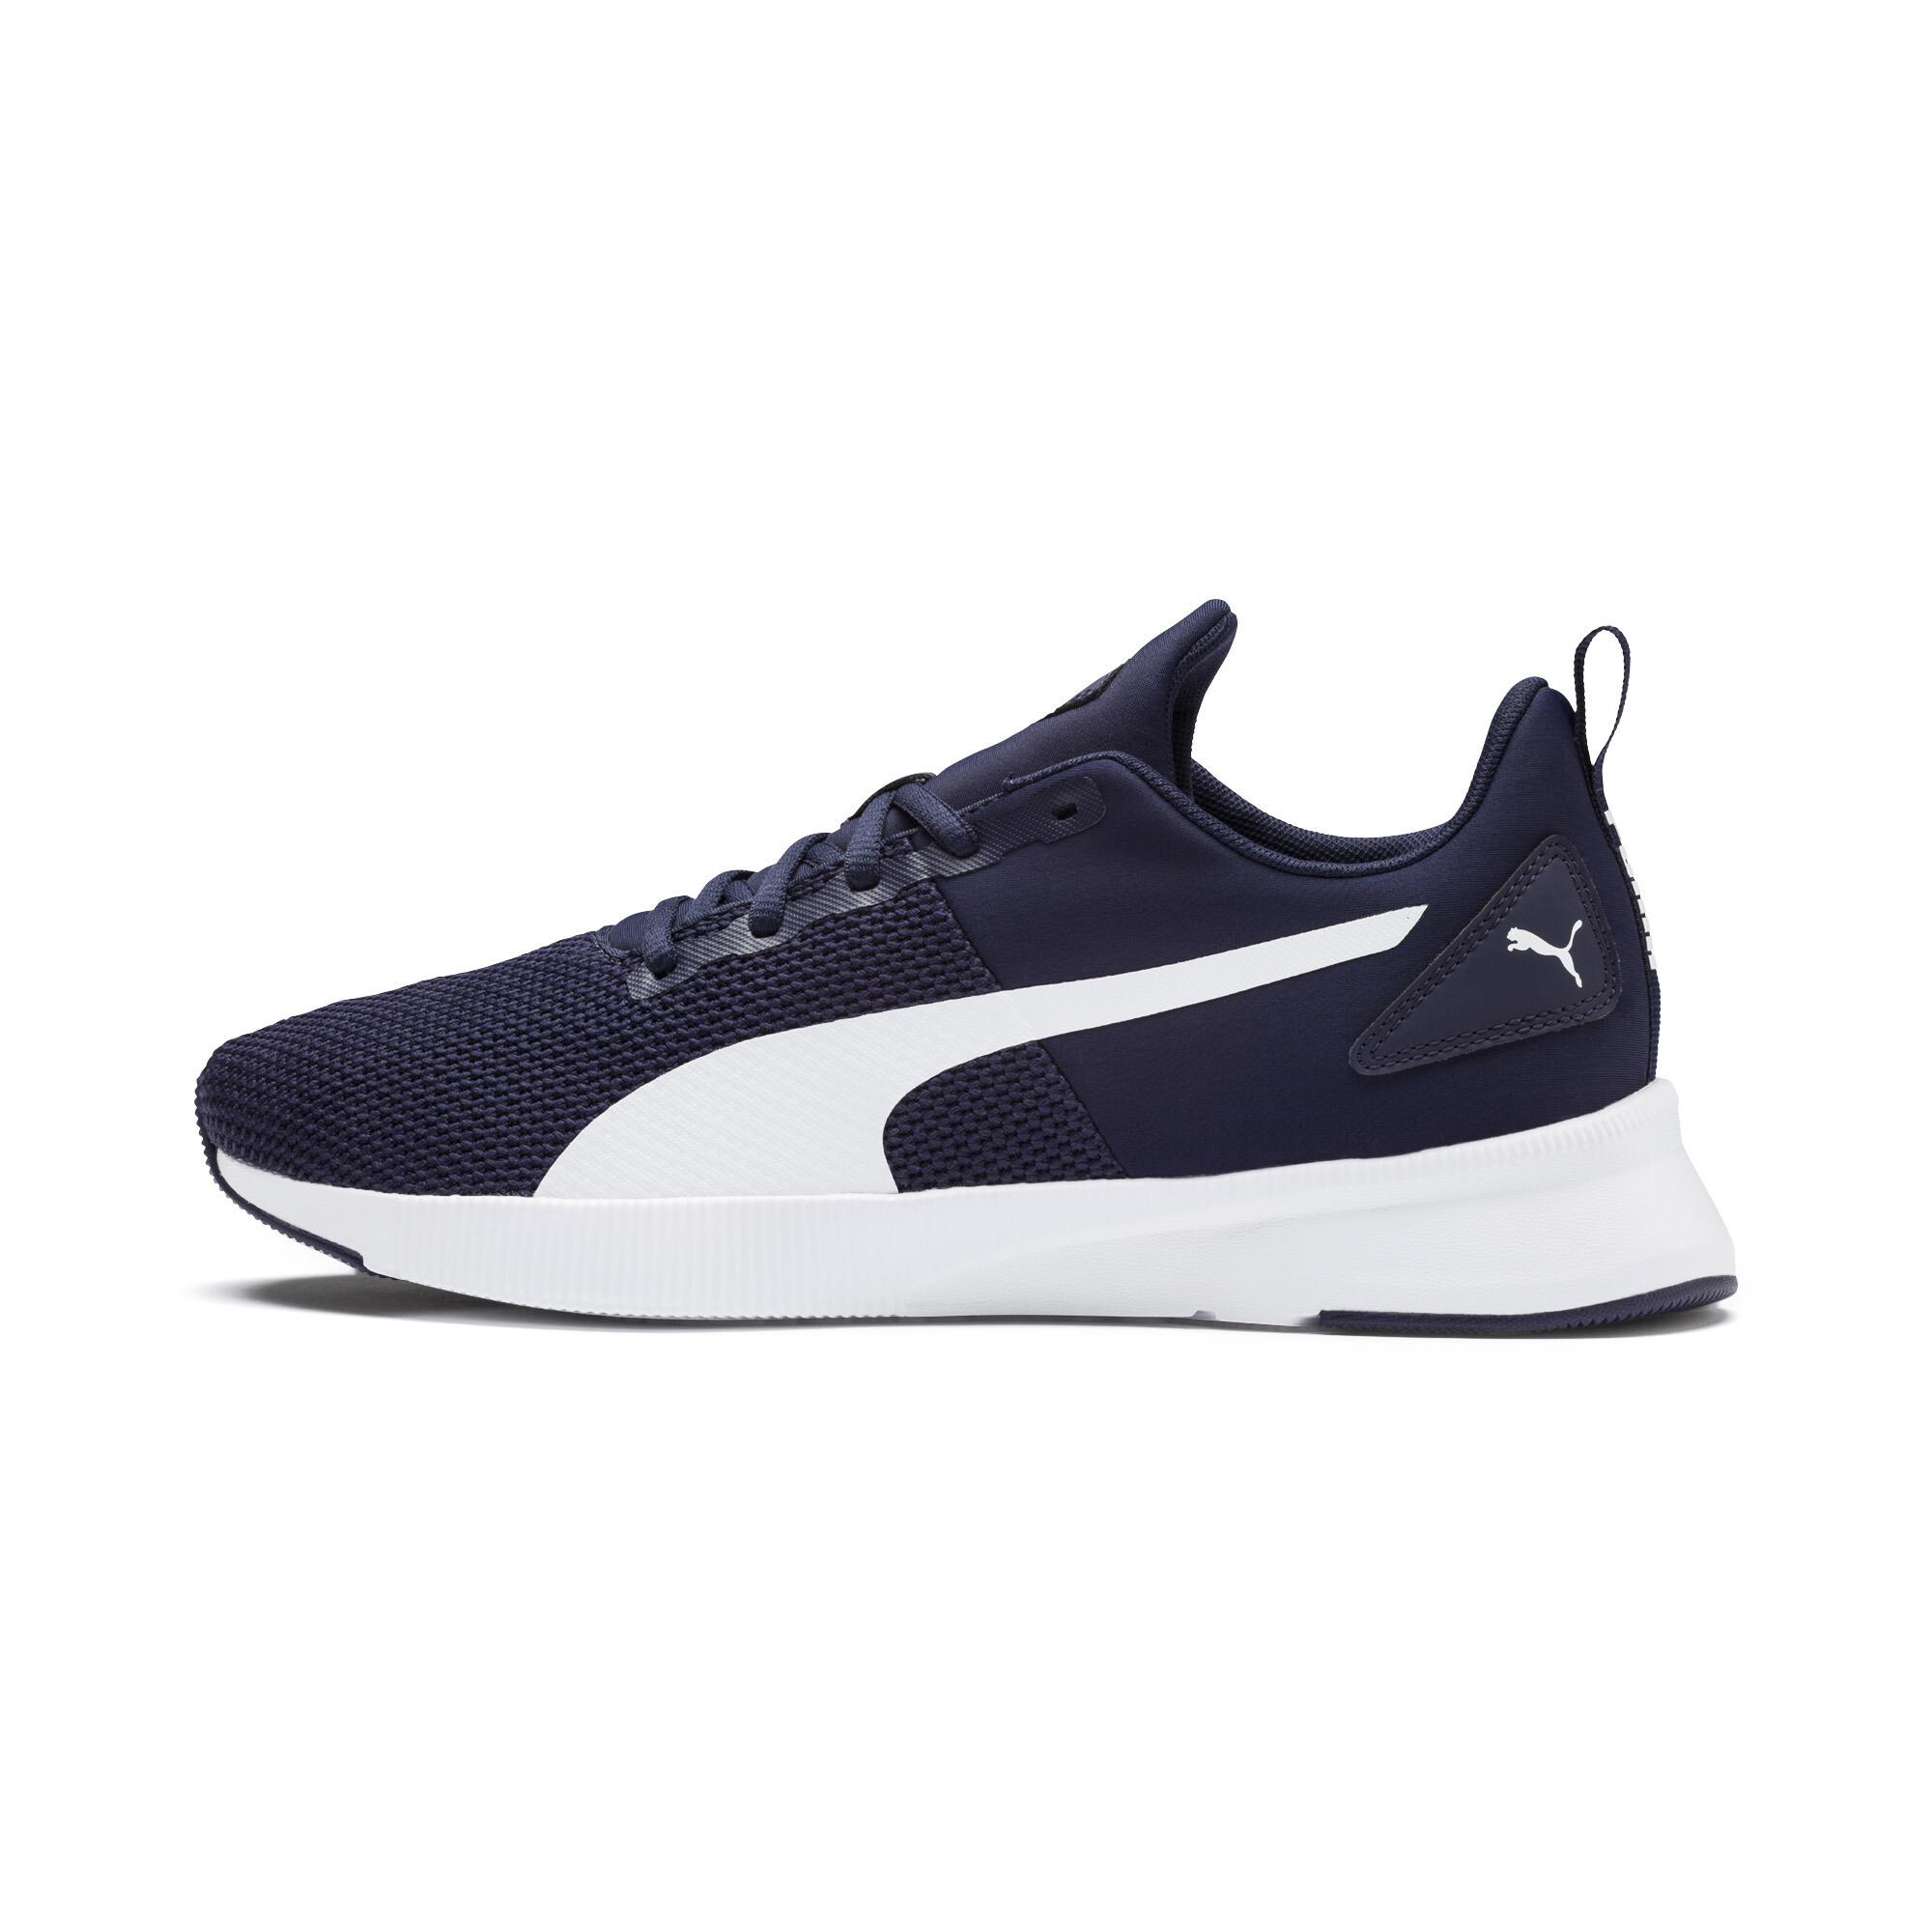 PUMA-Flyer-Runner-Running-Shoes-Mens-Shoe-Running thumbnail 10